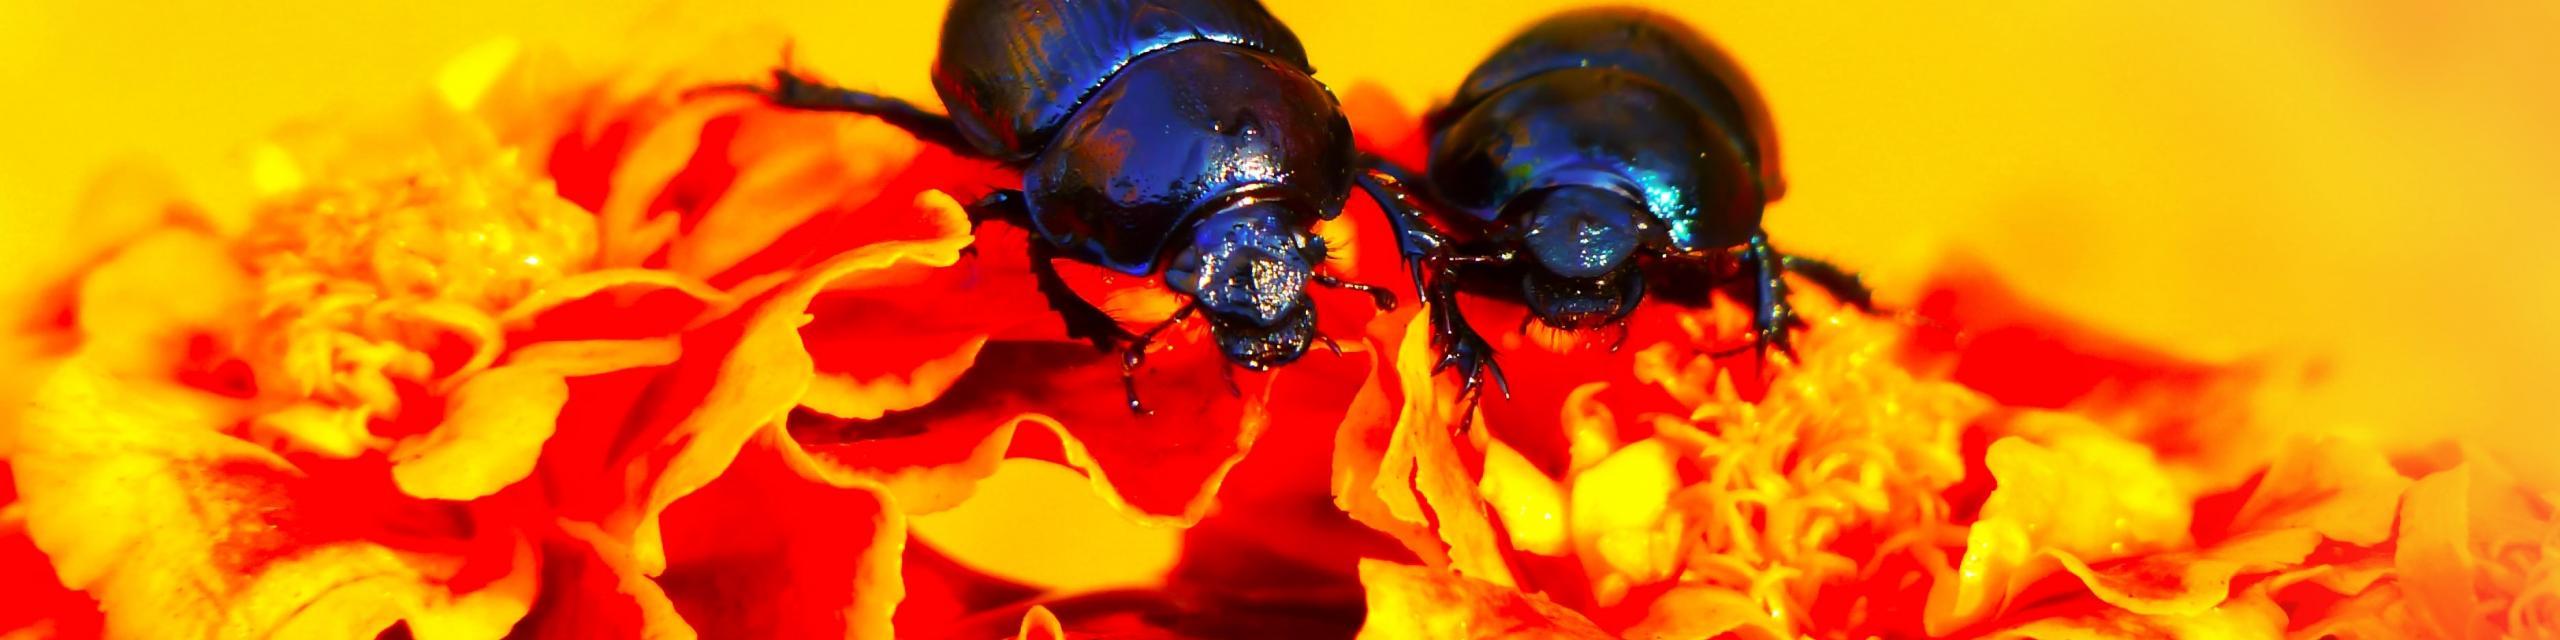 Humboldt Termite & Pest Control Services